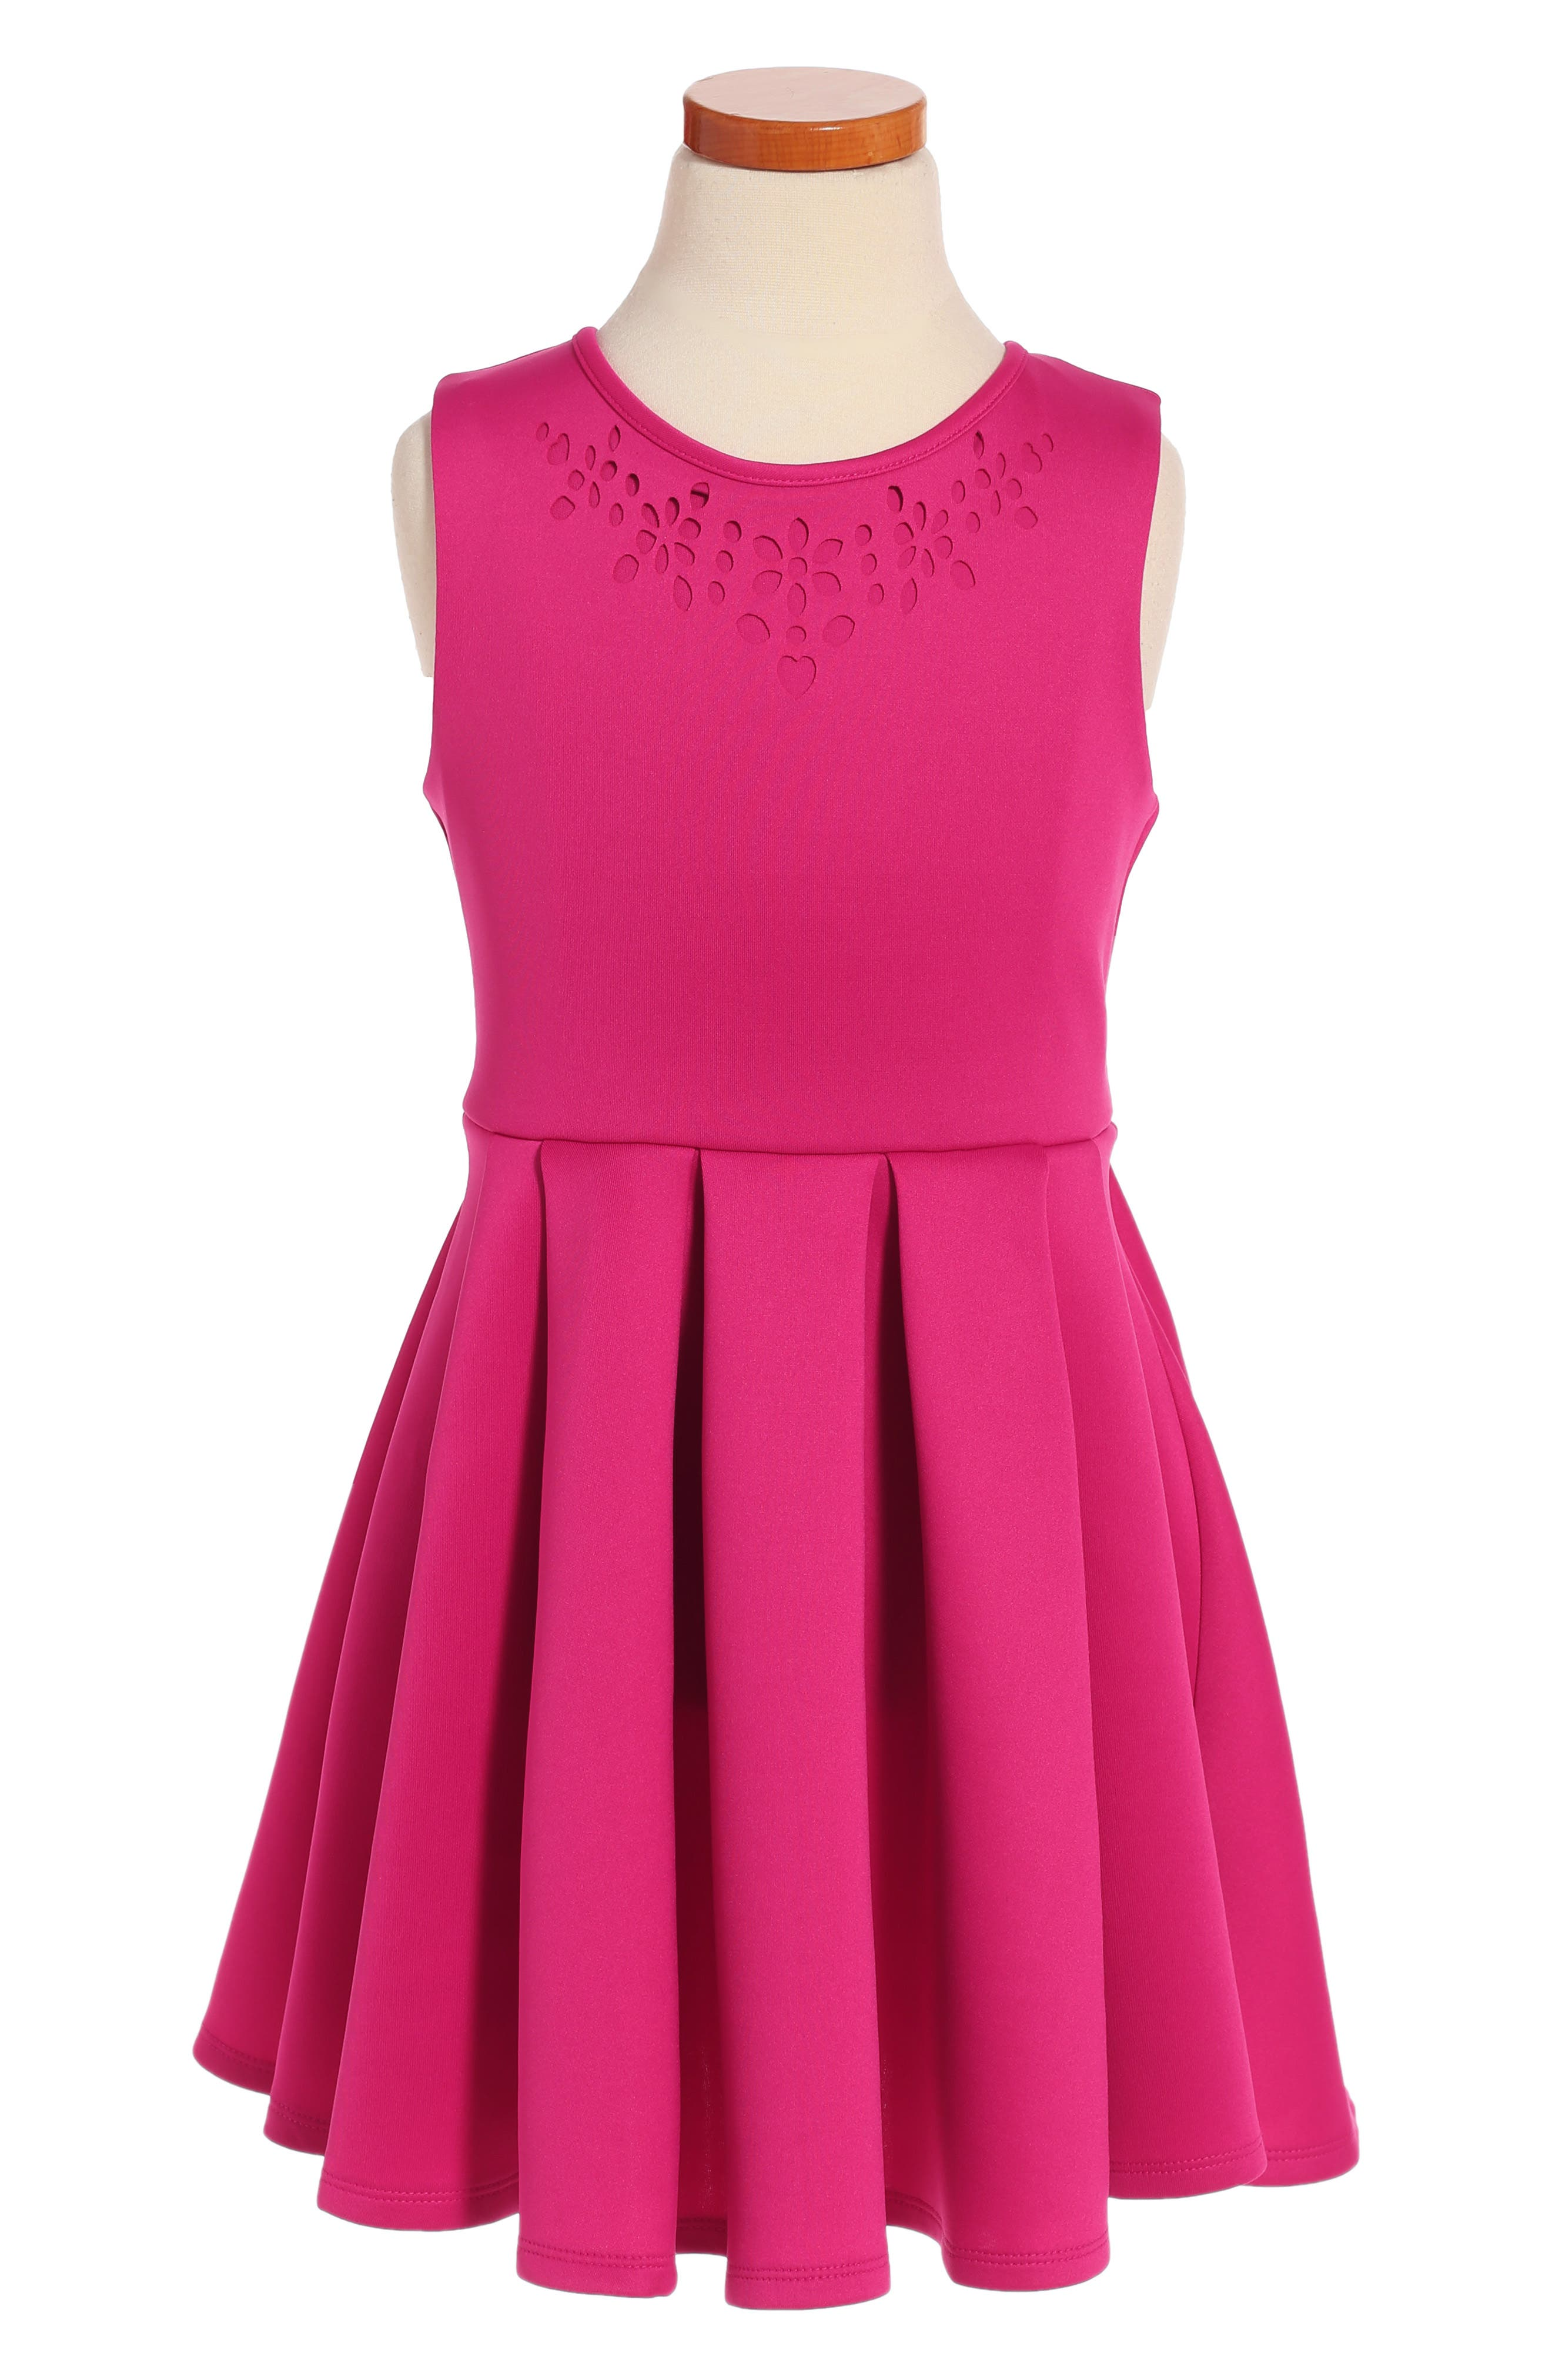 Blue christmas dress 4t - Blue Christmas Dress 4t 49